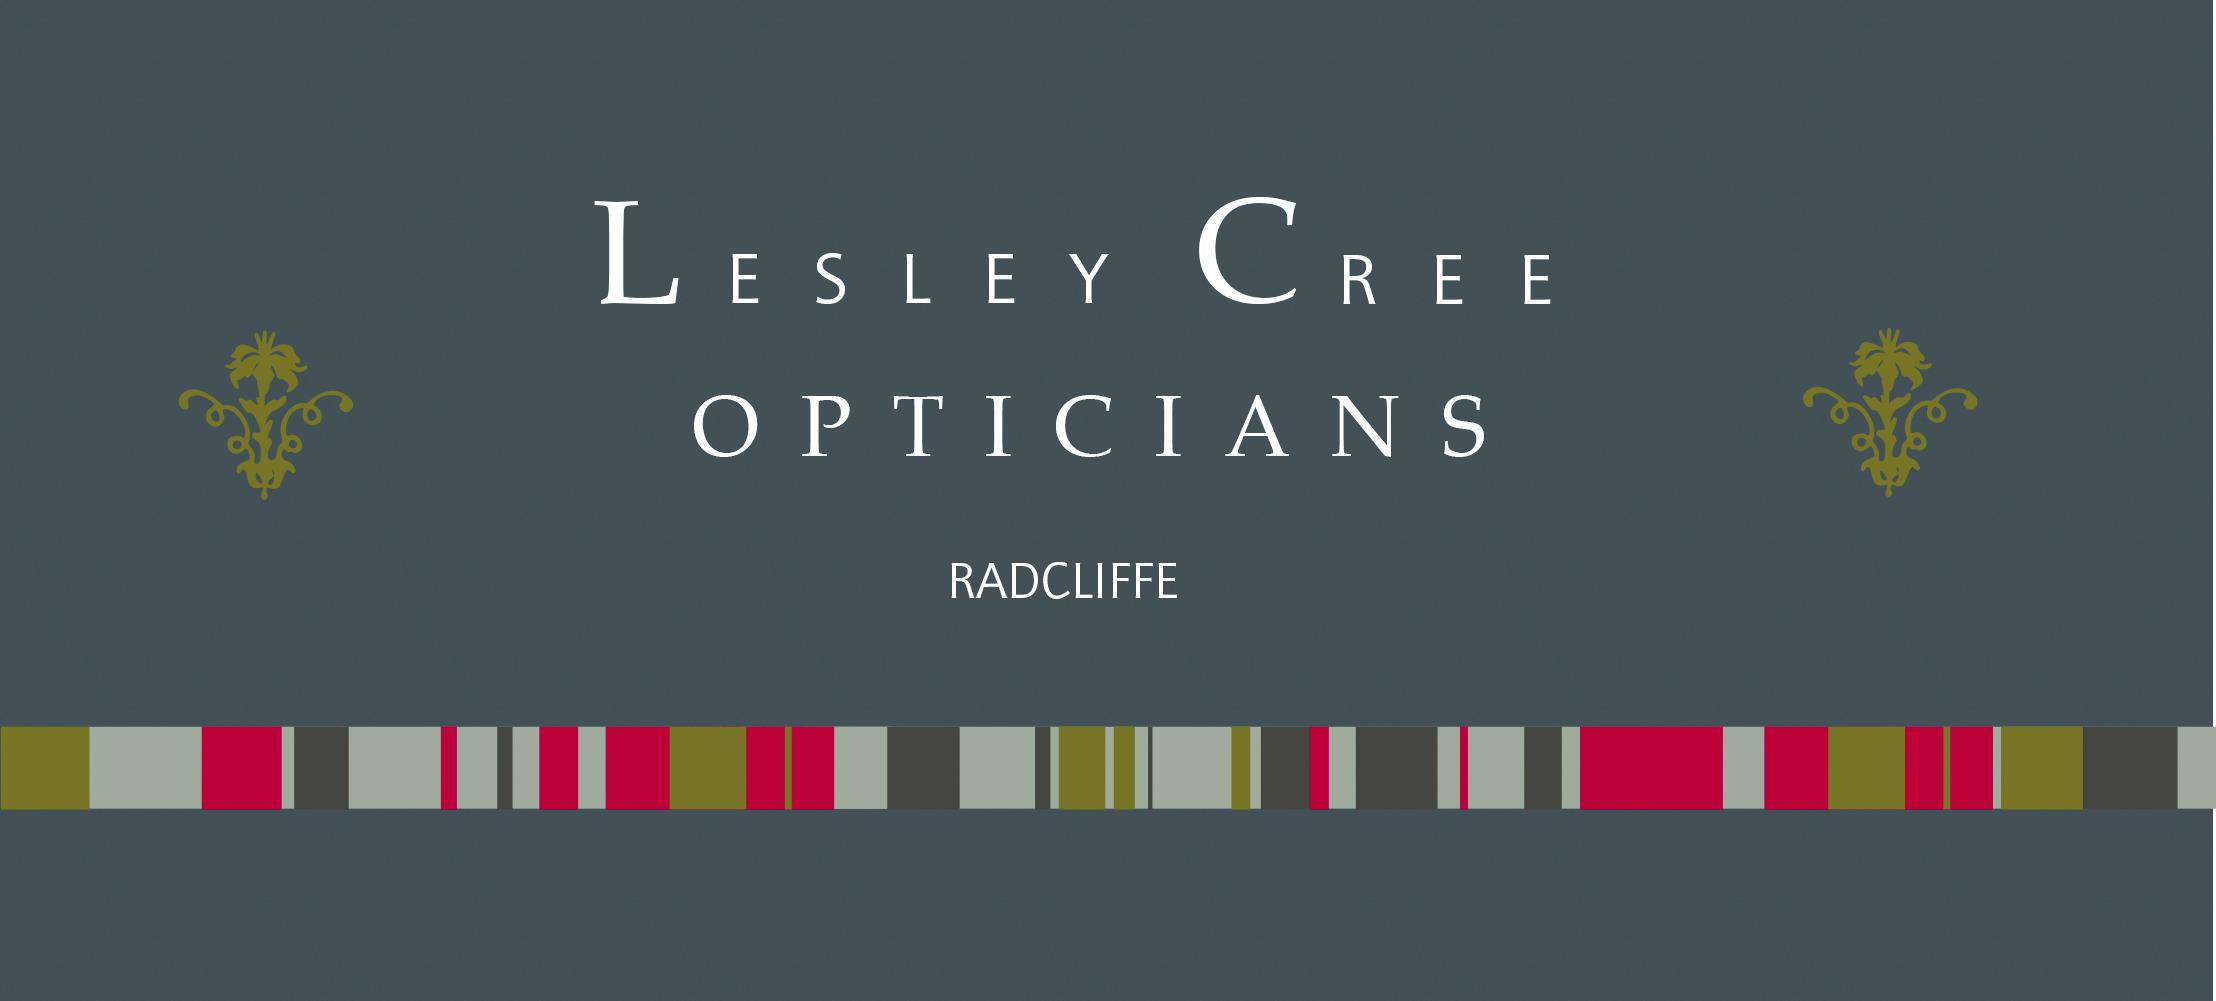 Lesley Cree Opticians